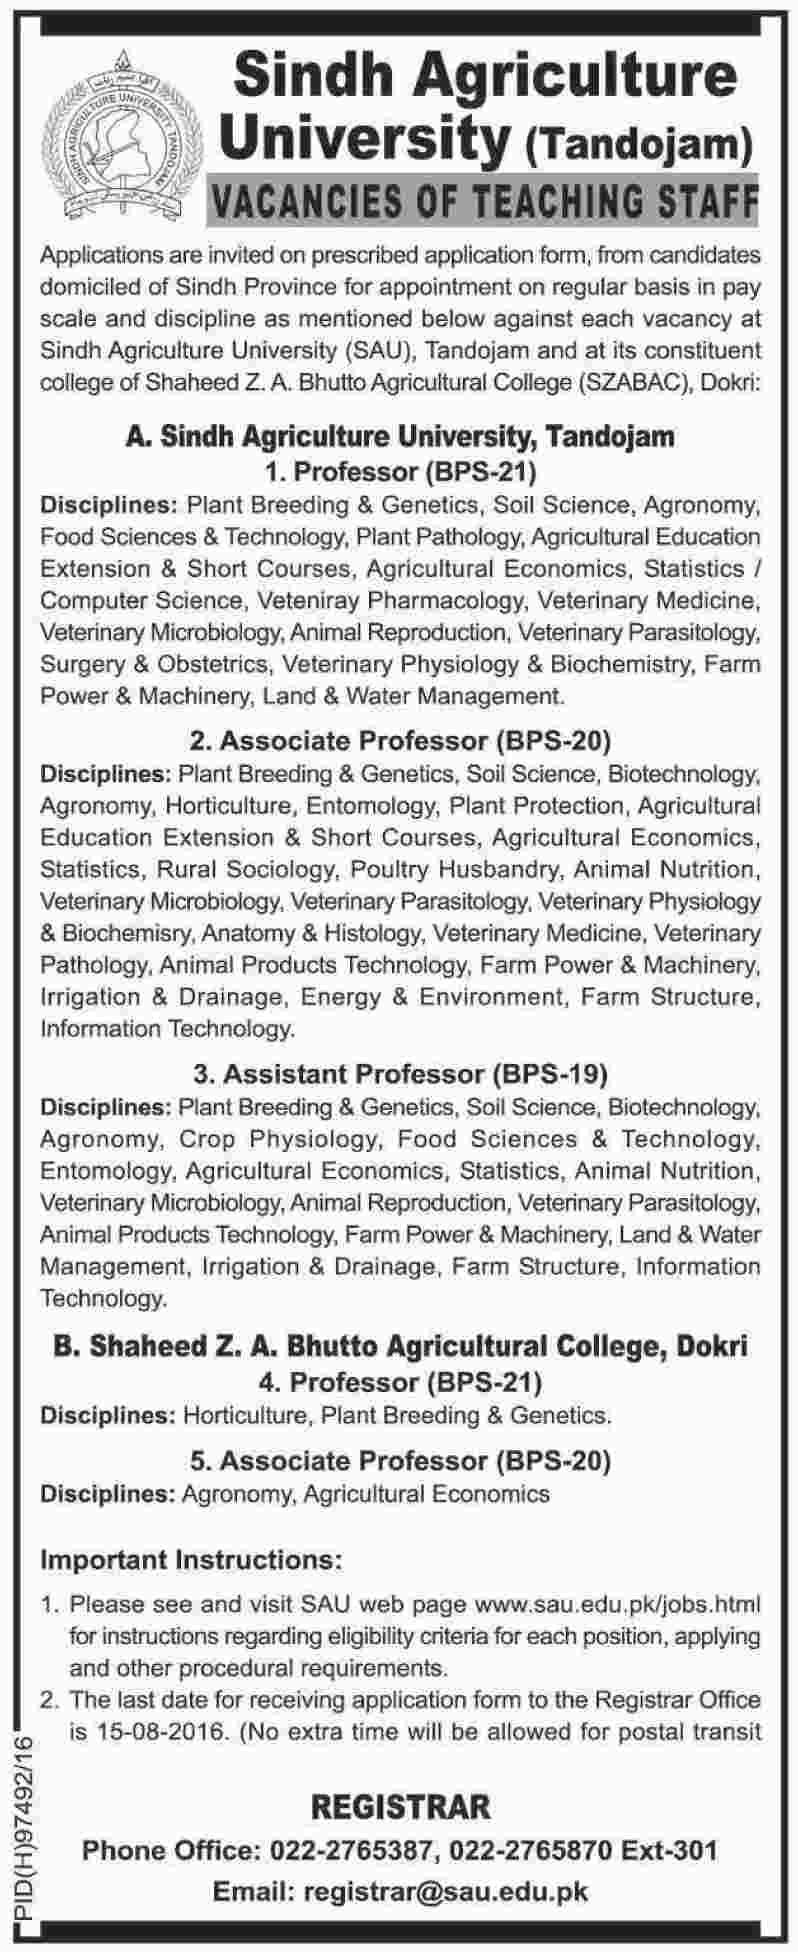 Sindh Agriculture University Tandojam Jobs 2016